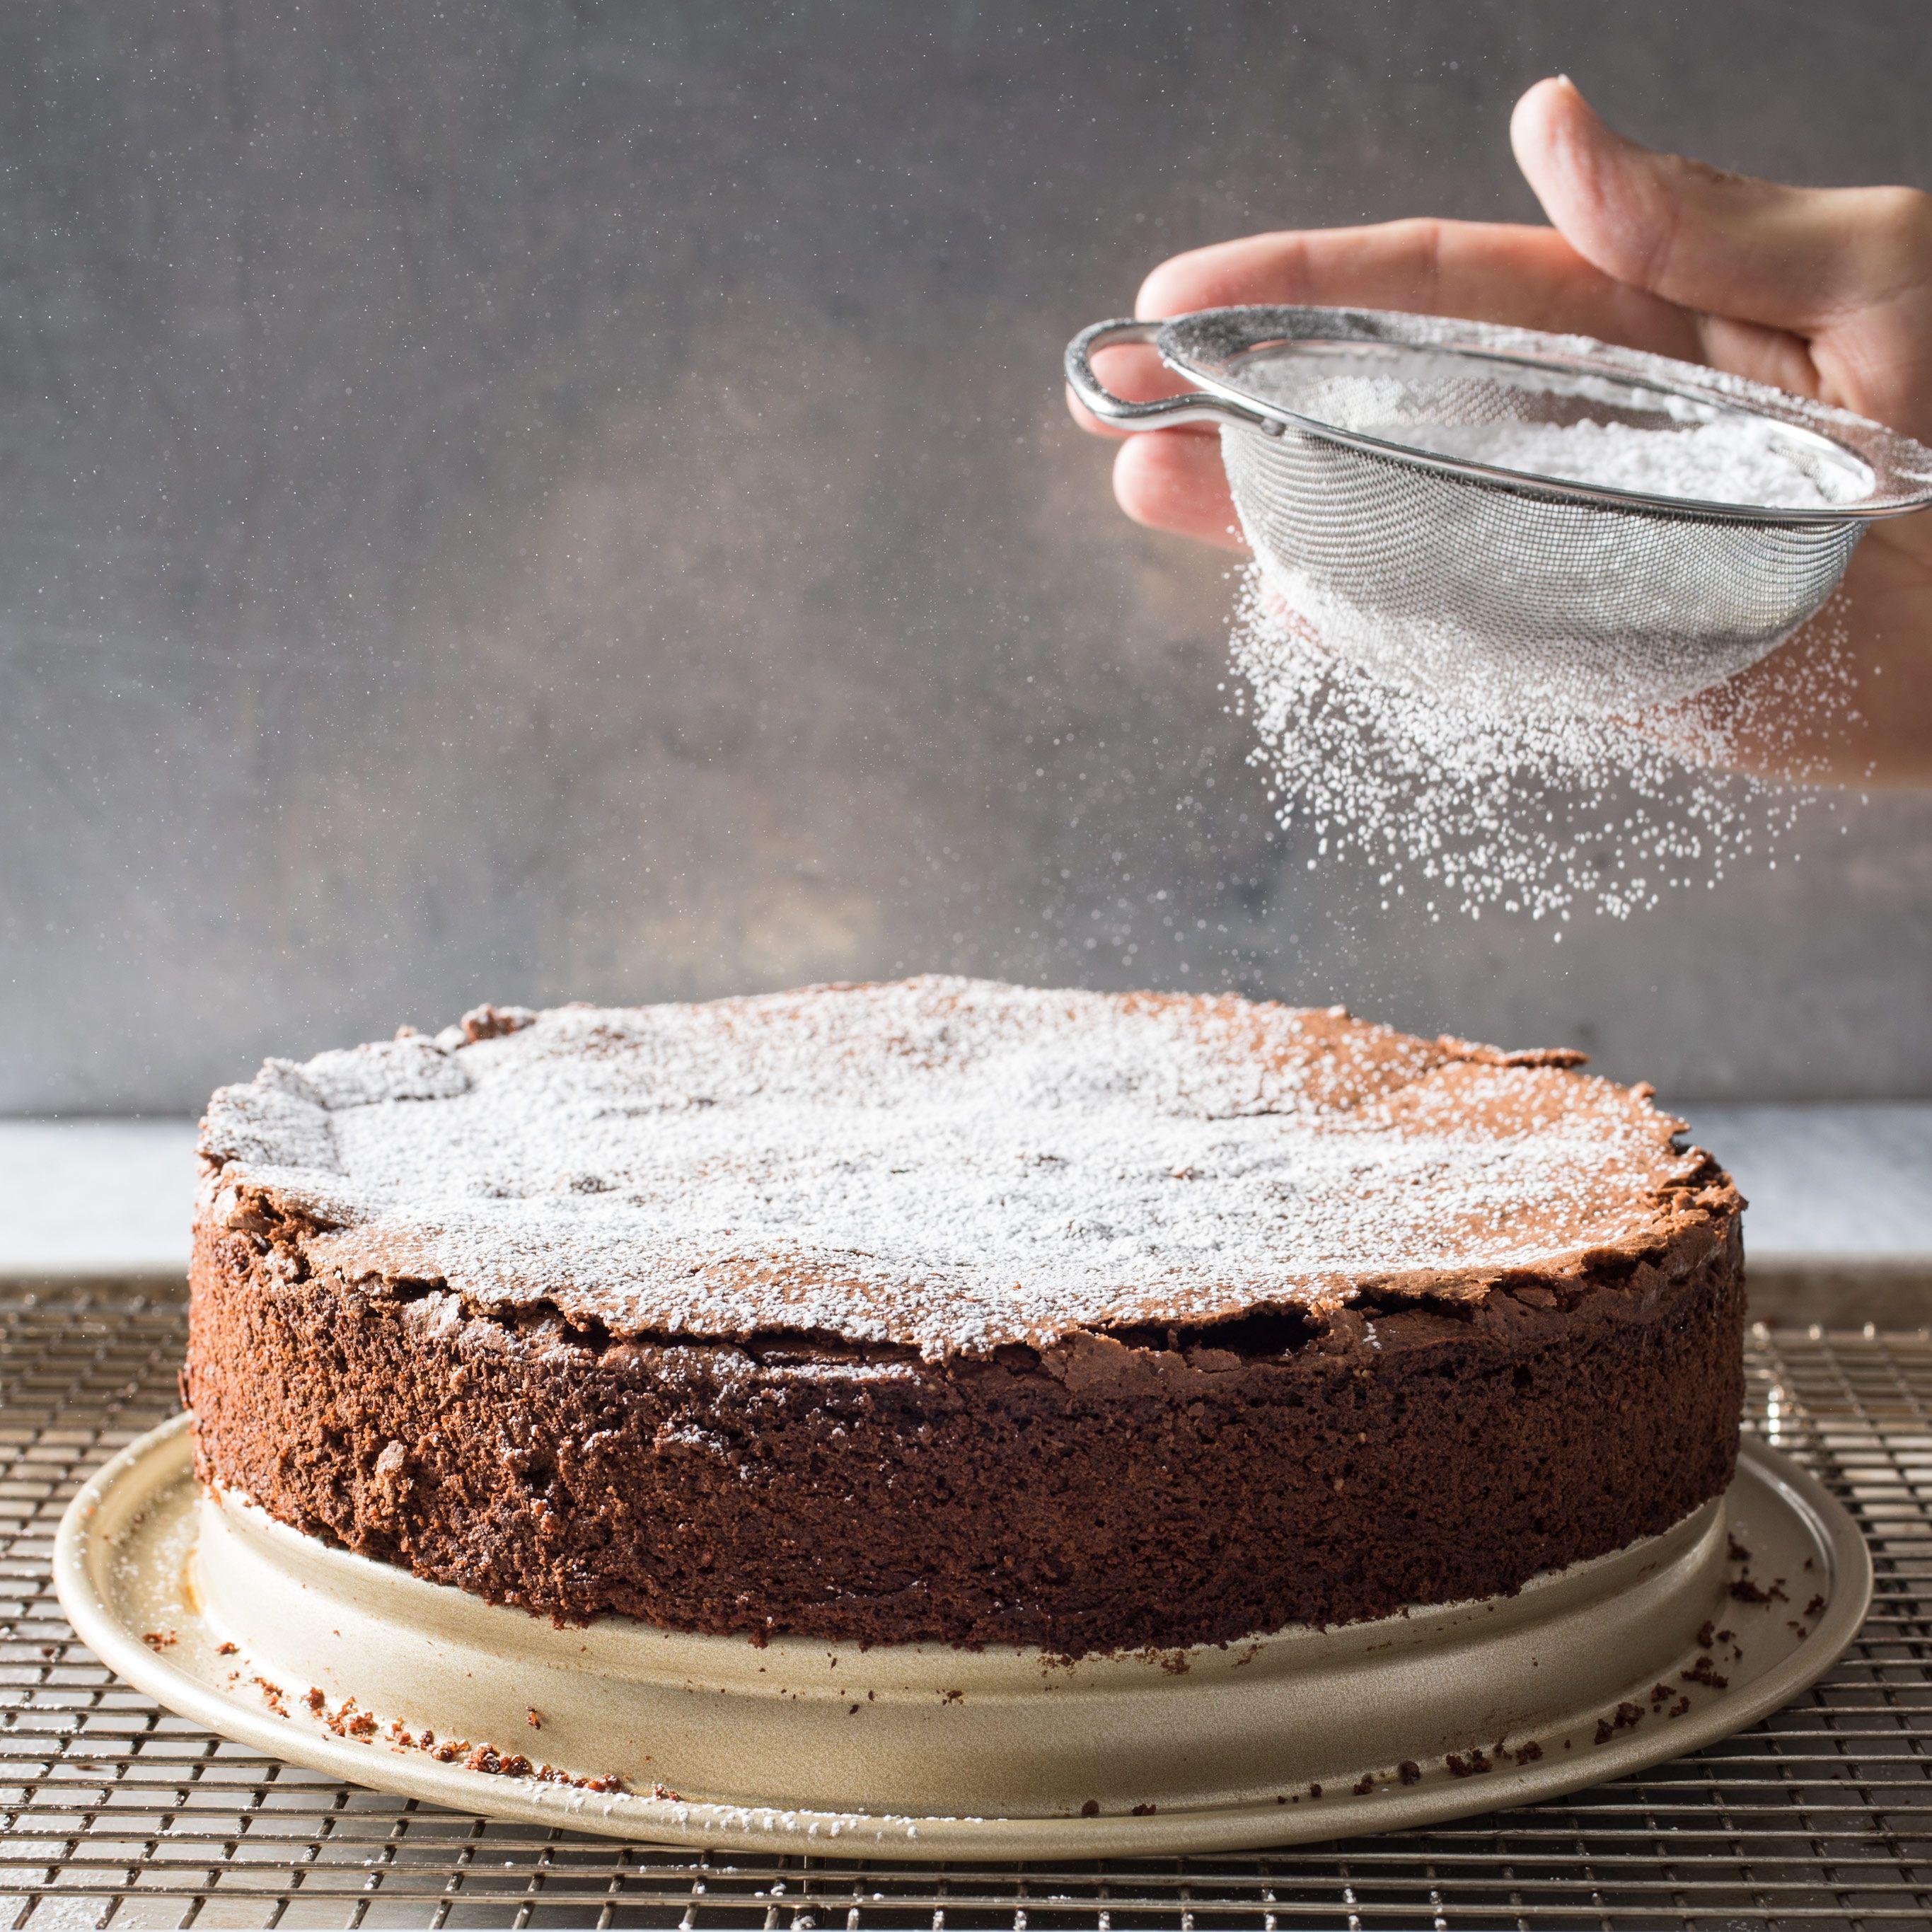 Torta Caprese Cook S Illustrated Recipe Flourless Chocolate Cakes Almond Desserts Almond Cakes